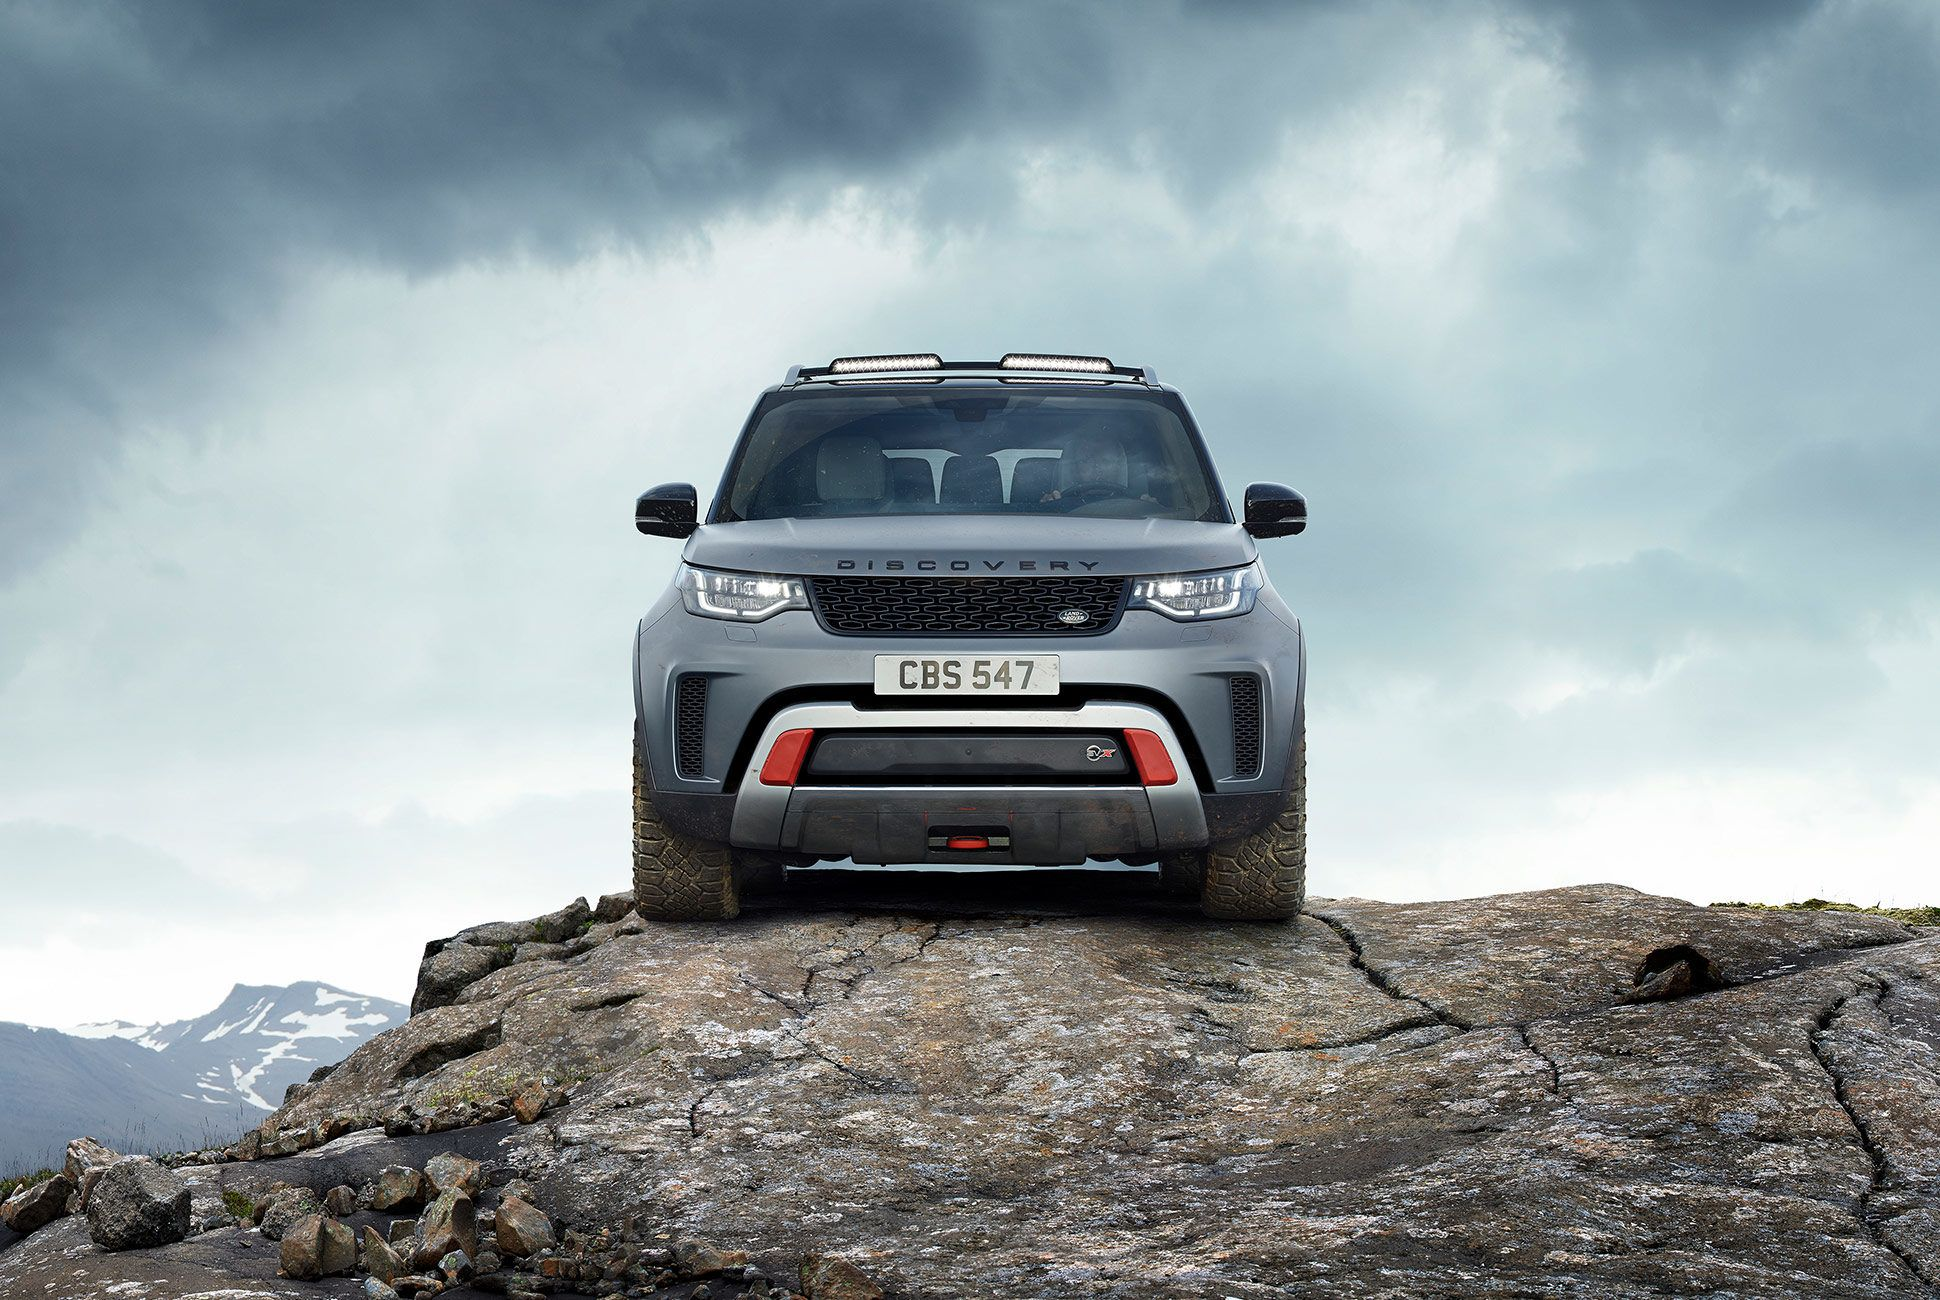 Land-Rover-Discovery-SVX-gear-patrol-7